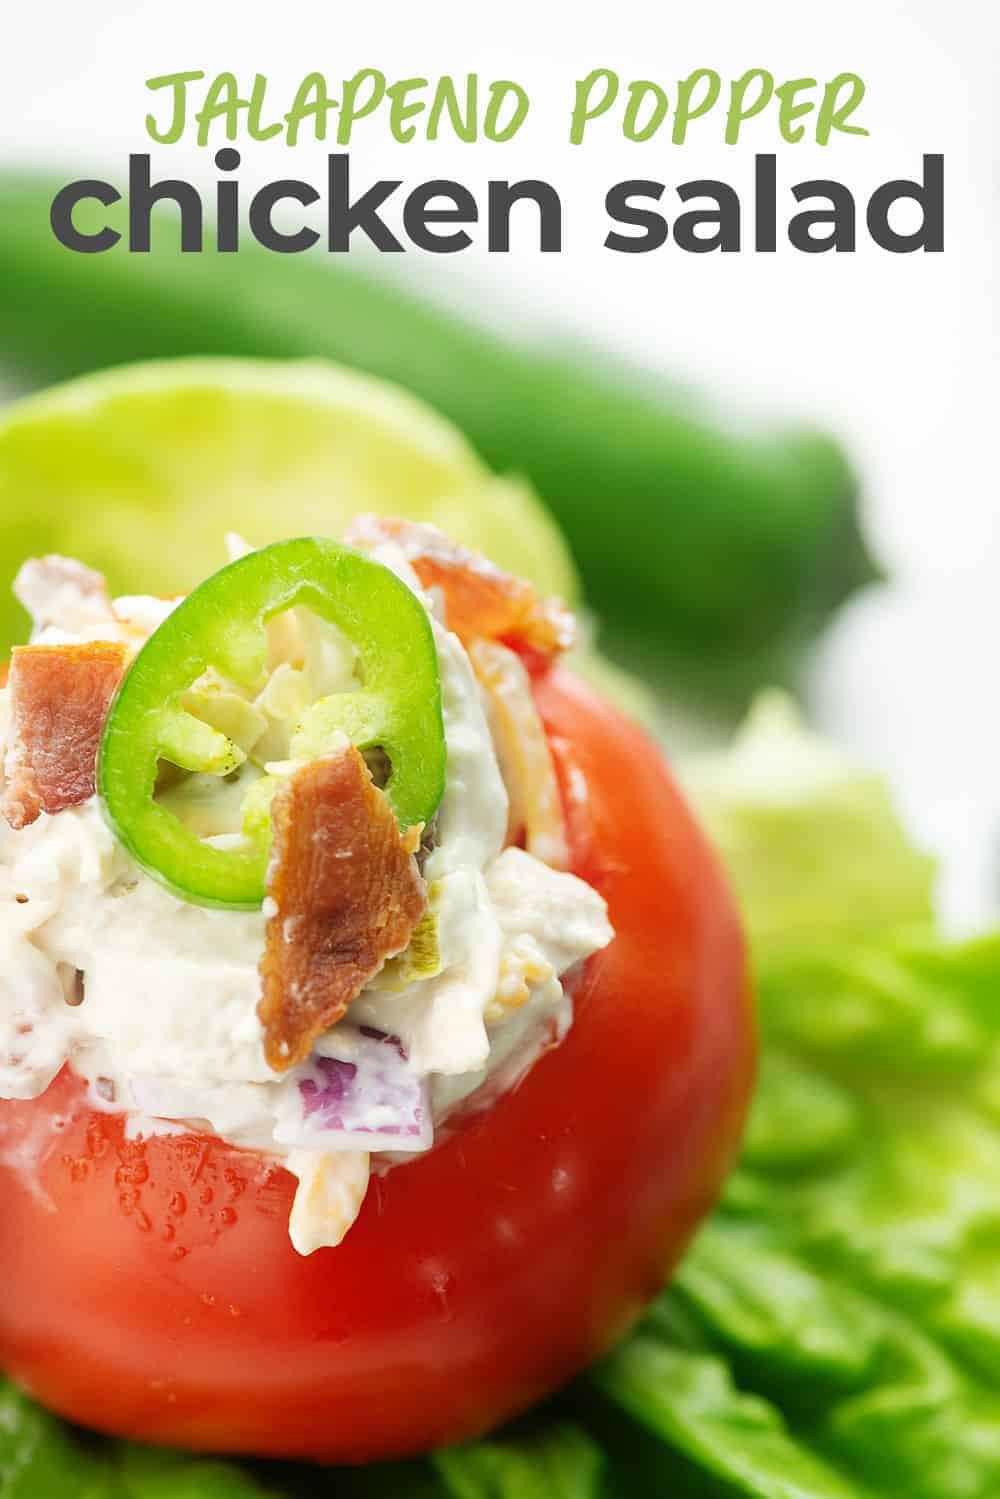 jalapeno popper chicken salad stuffed inside a tomato salad stuffed in tomato